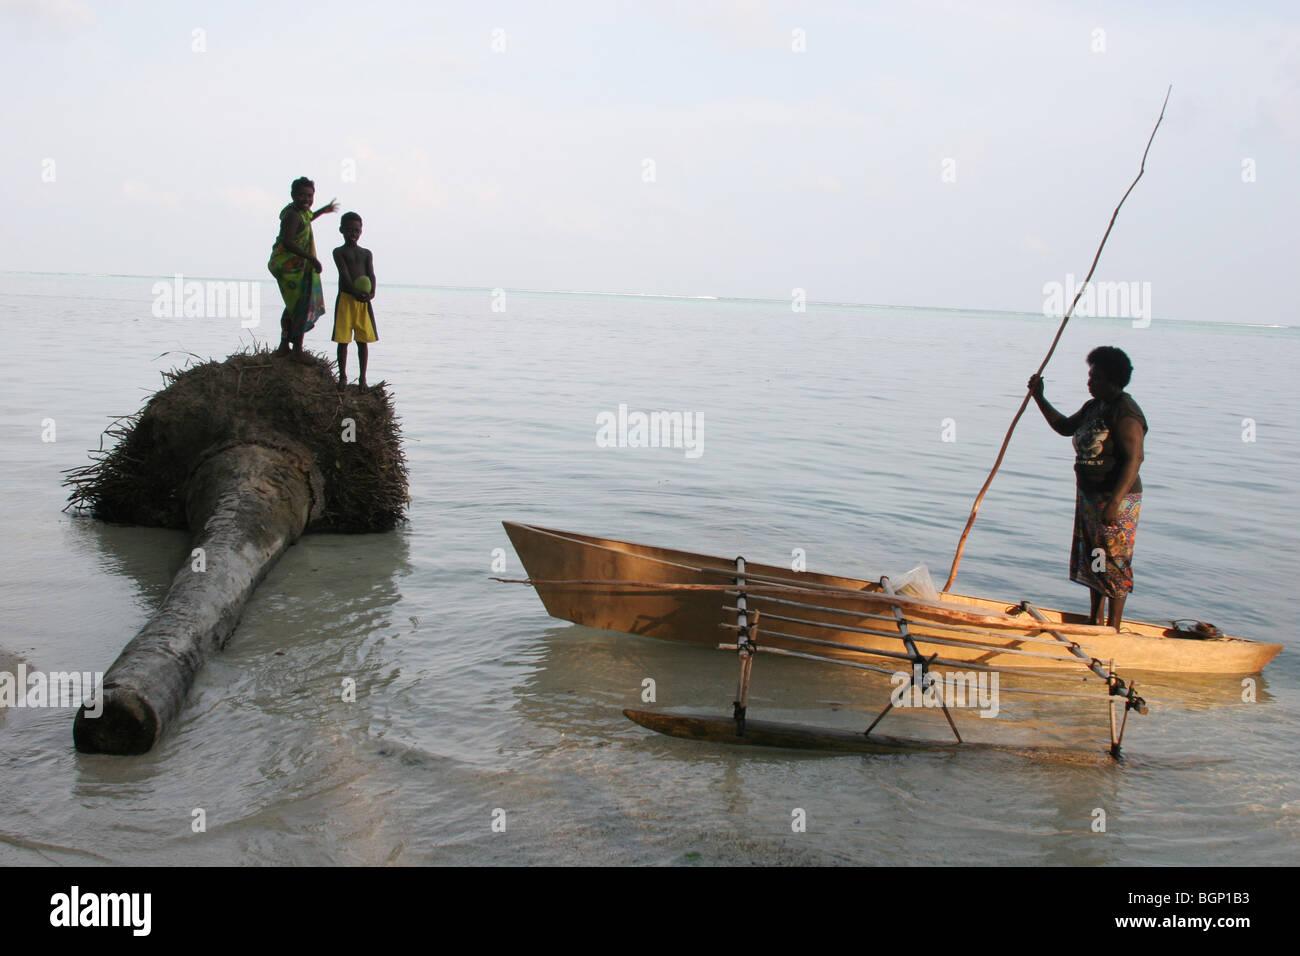 on Han Island, Carterets Atoll, Papua New Guinea - Stock Image